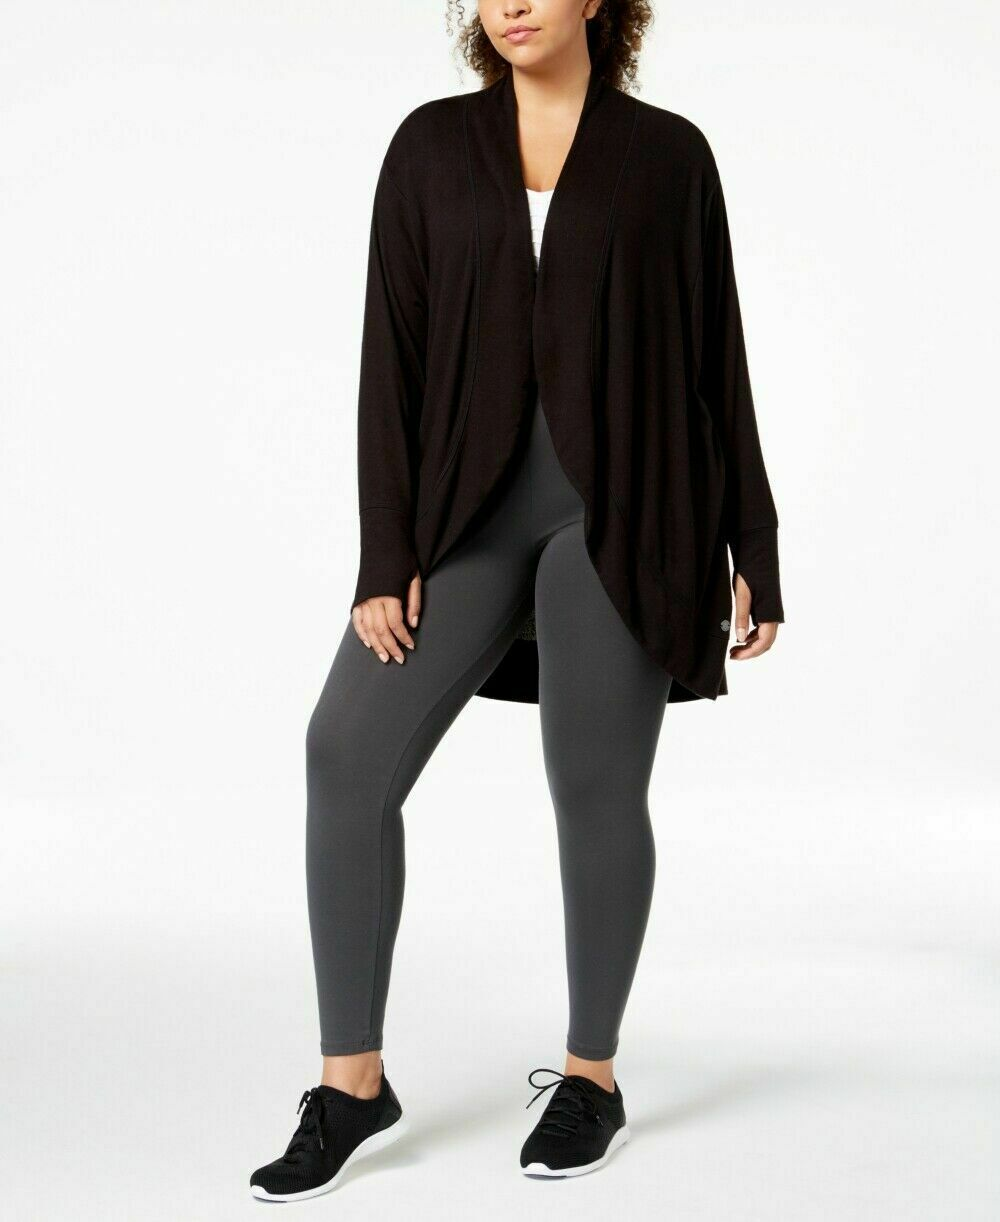 Ideology Womens Open-Front Wrap Noir Size 2X - $22.71